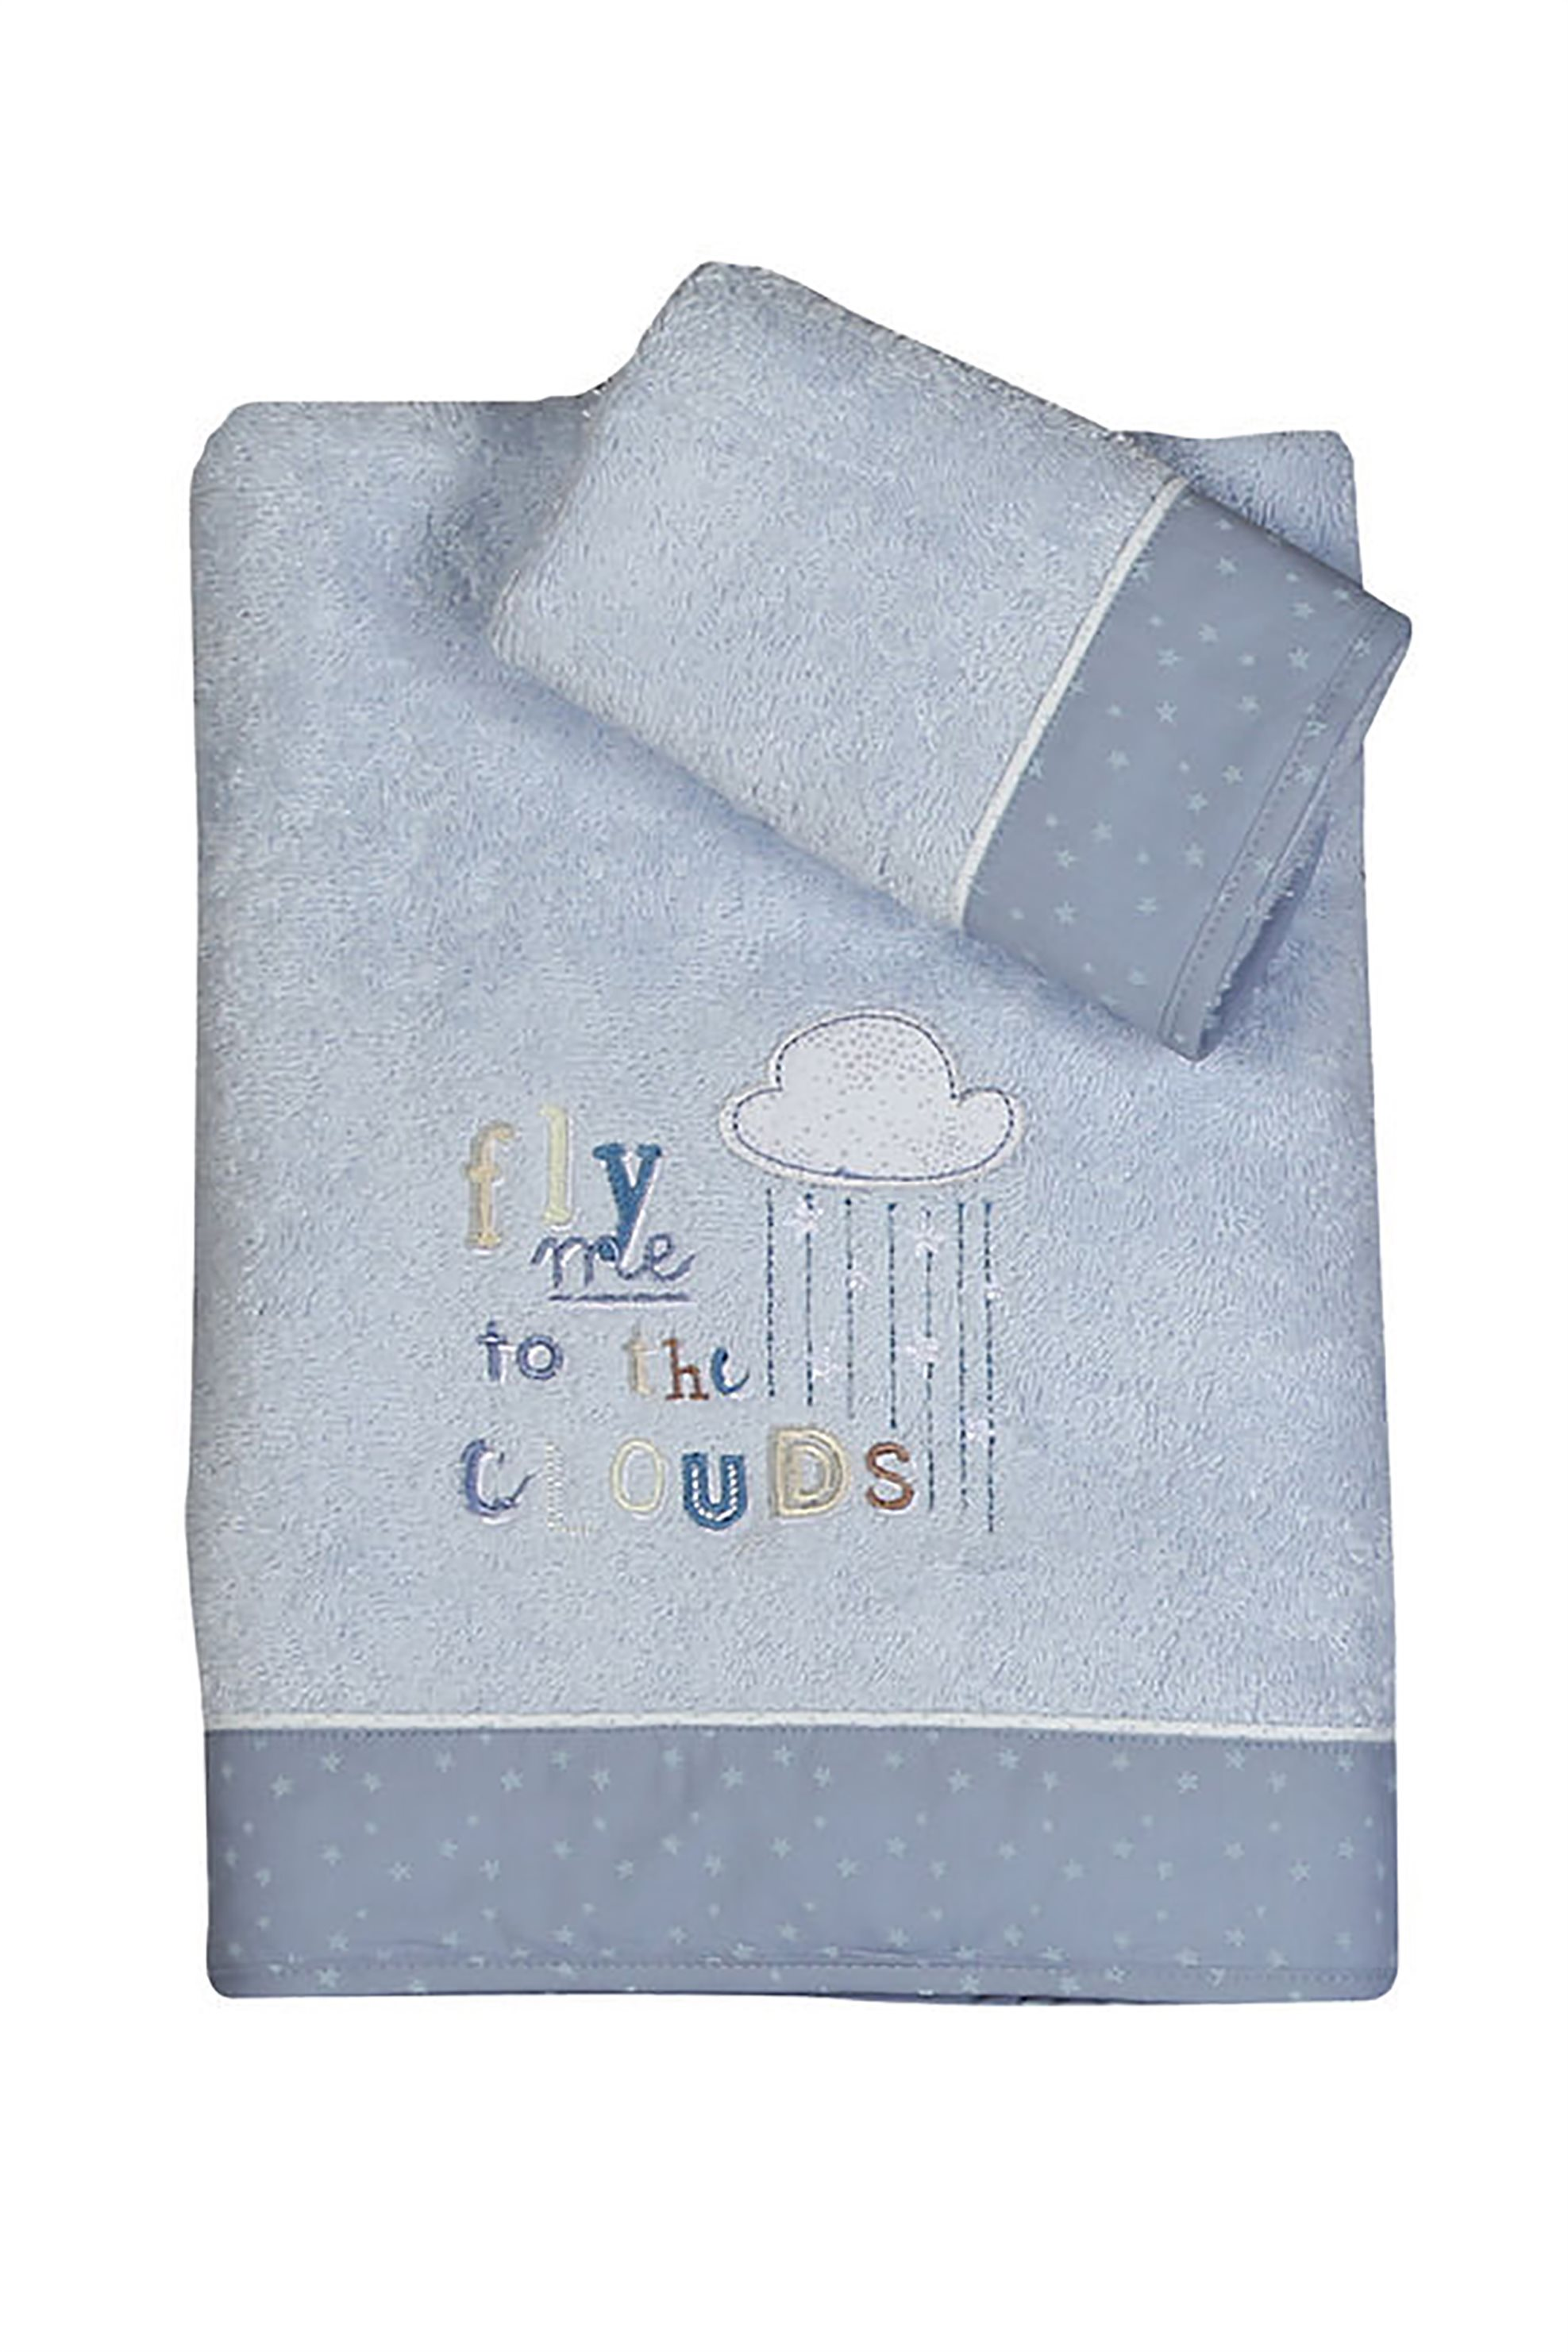 NEF-NEF Σετ βρεφικές πετσέτες Clouds (2 τεμάχια)  - 021493 - Γκρι Γαλάζιο home   παιδια   πετσέτες   σετ παιδικές πετσέτες